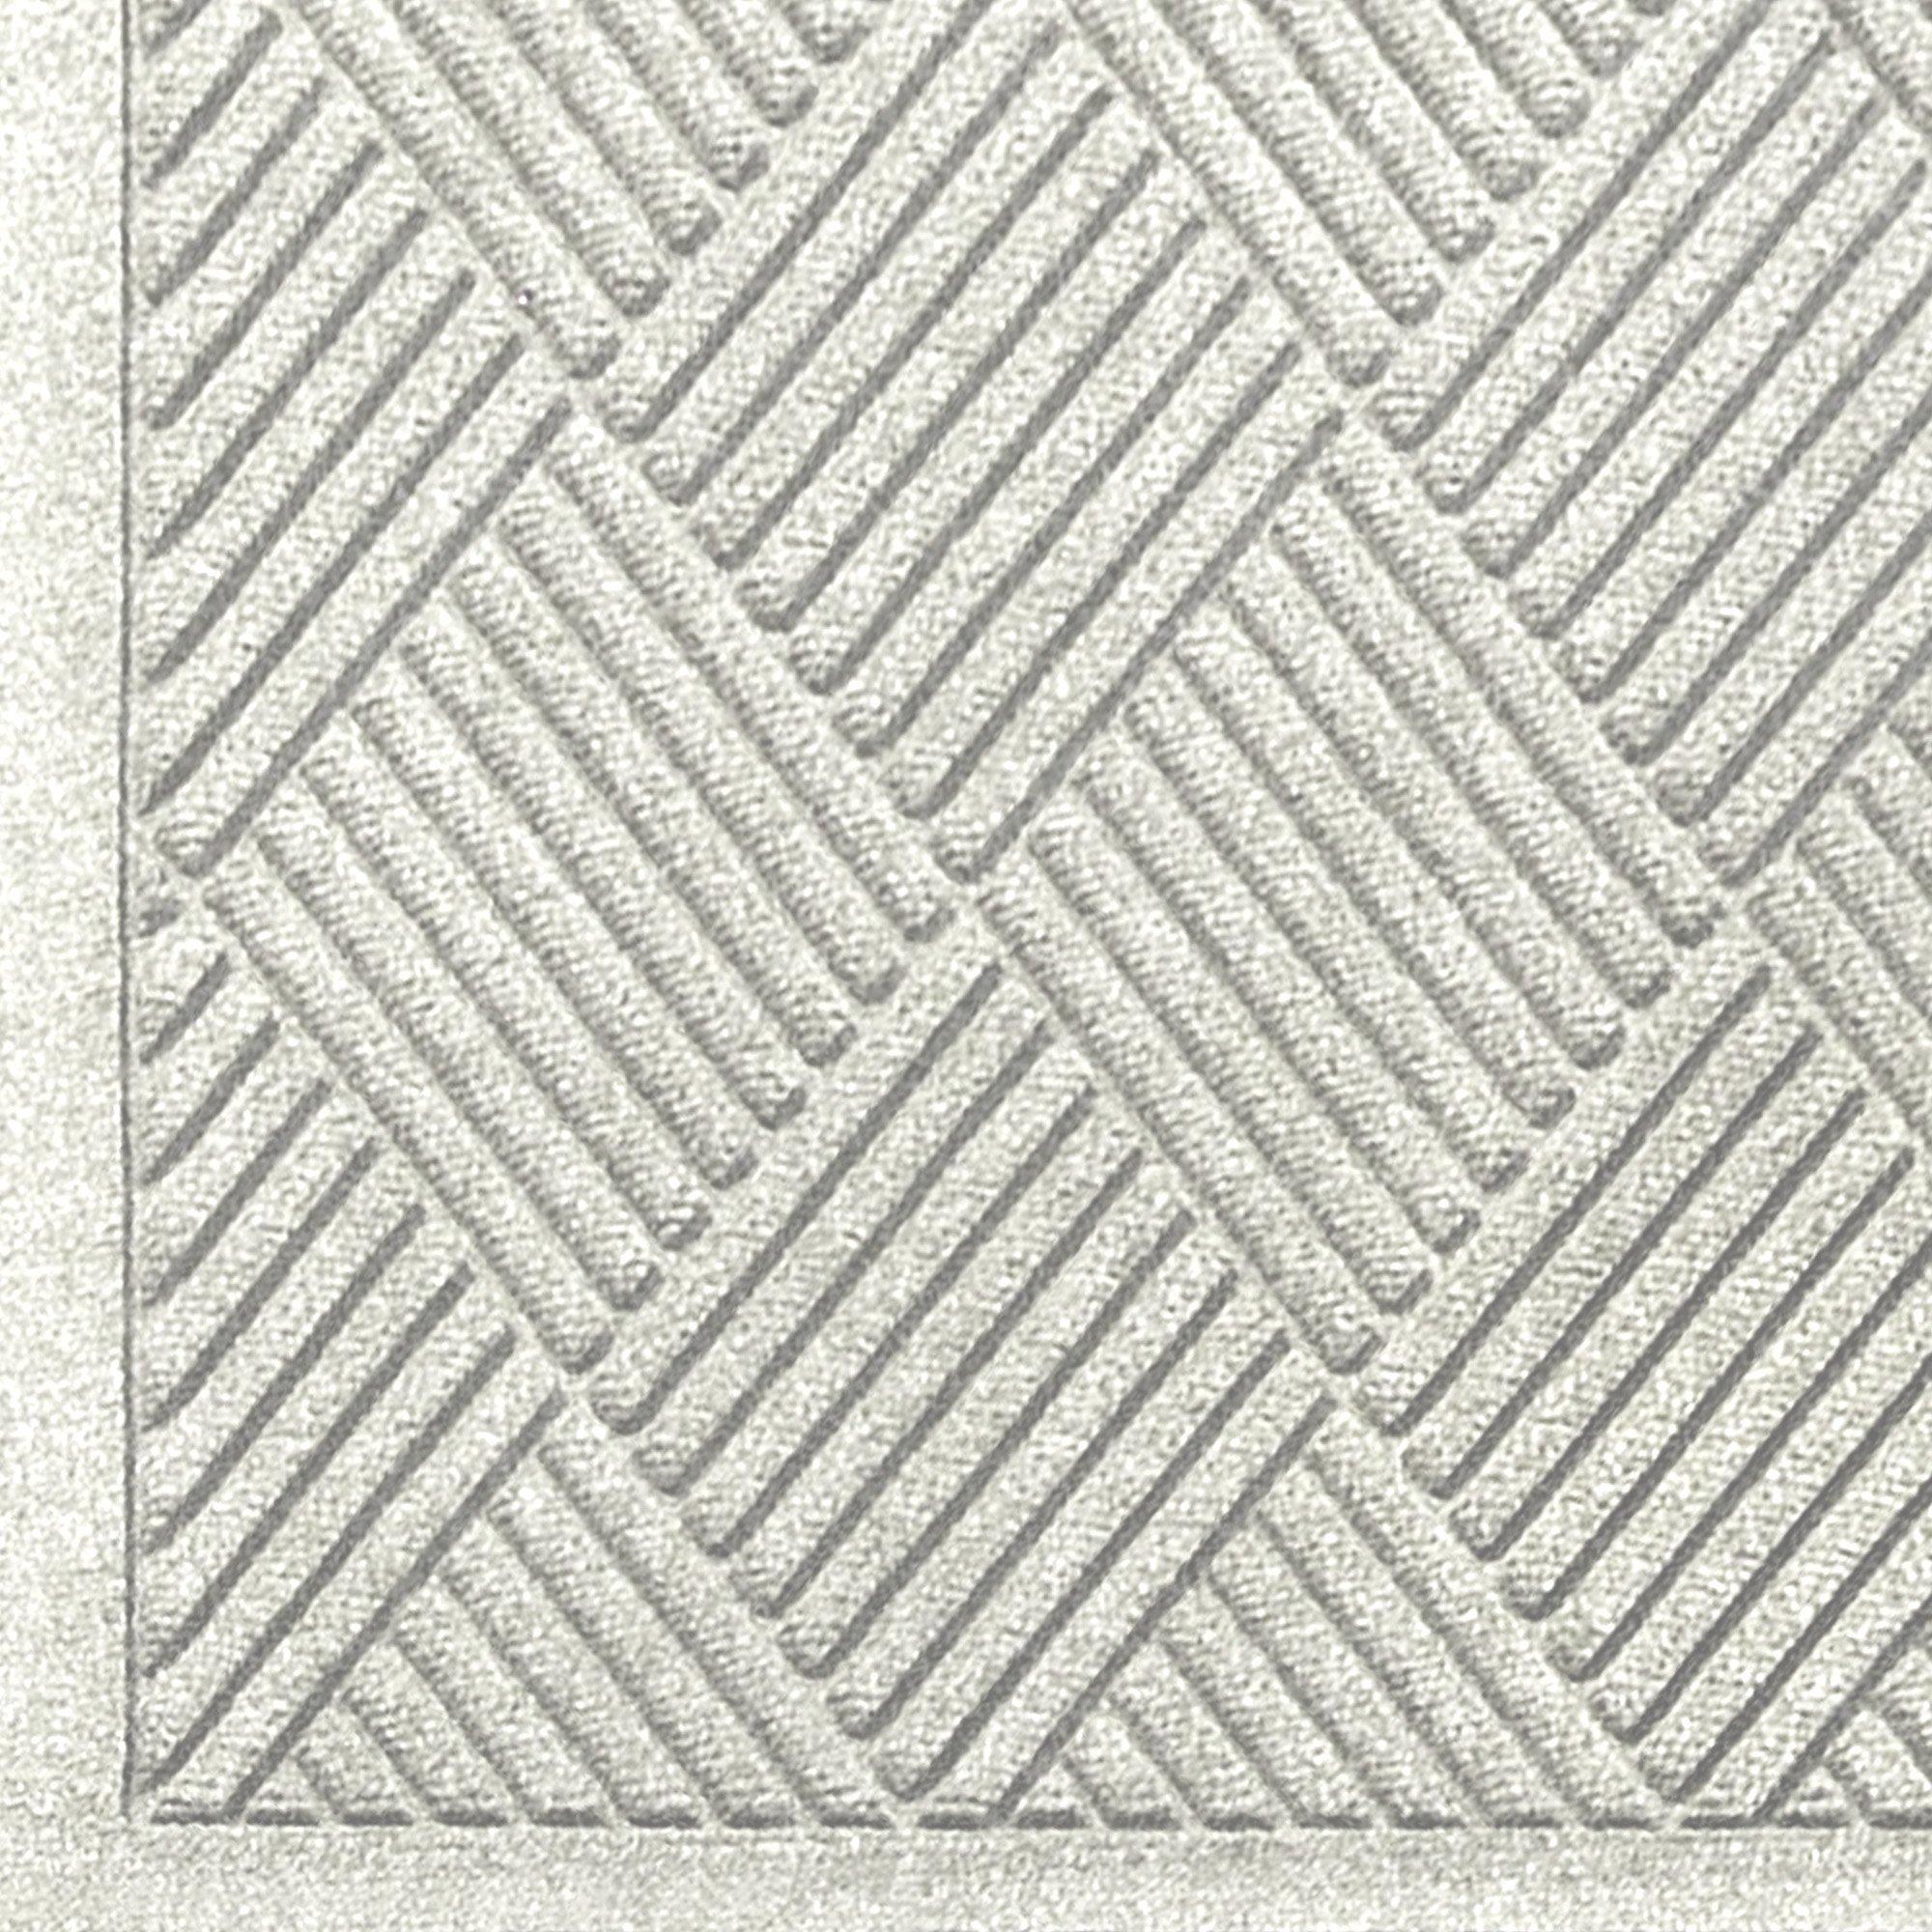 "M+A Matting 221 Waterhog Fashion Diamond Polypropylene Fiber Entrance Indoor/Outdoor Floor Mat, SBR Rubber Backing, 5' Length x 3' Width, 3/8"" Thick, White"